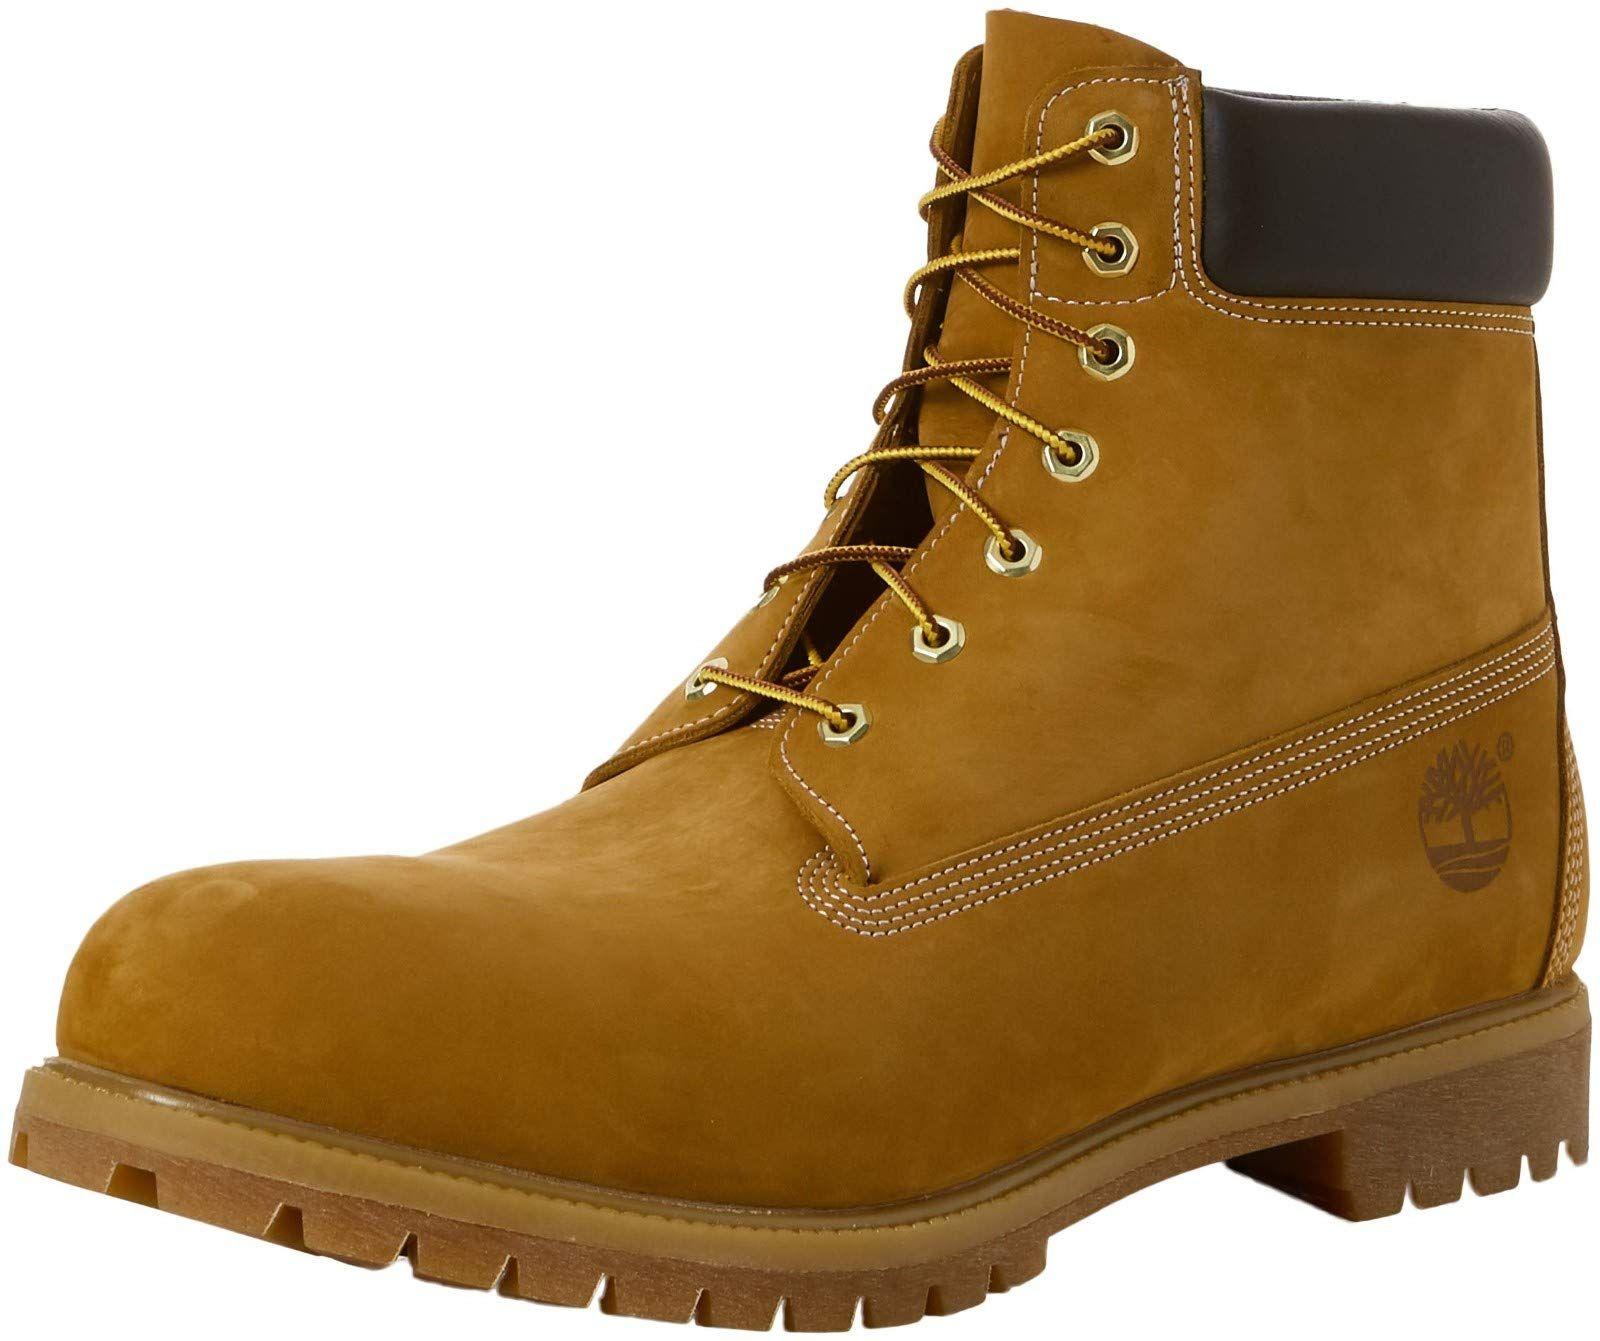 Timberland Black Big Kids Boots Size 4 Youth Premium Waterproof Nubuck Suede